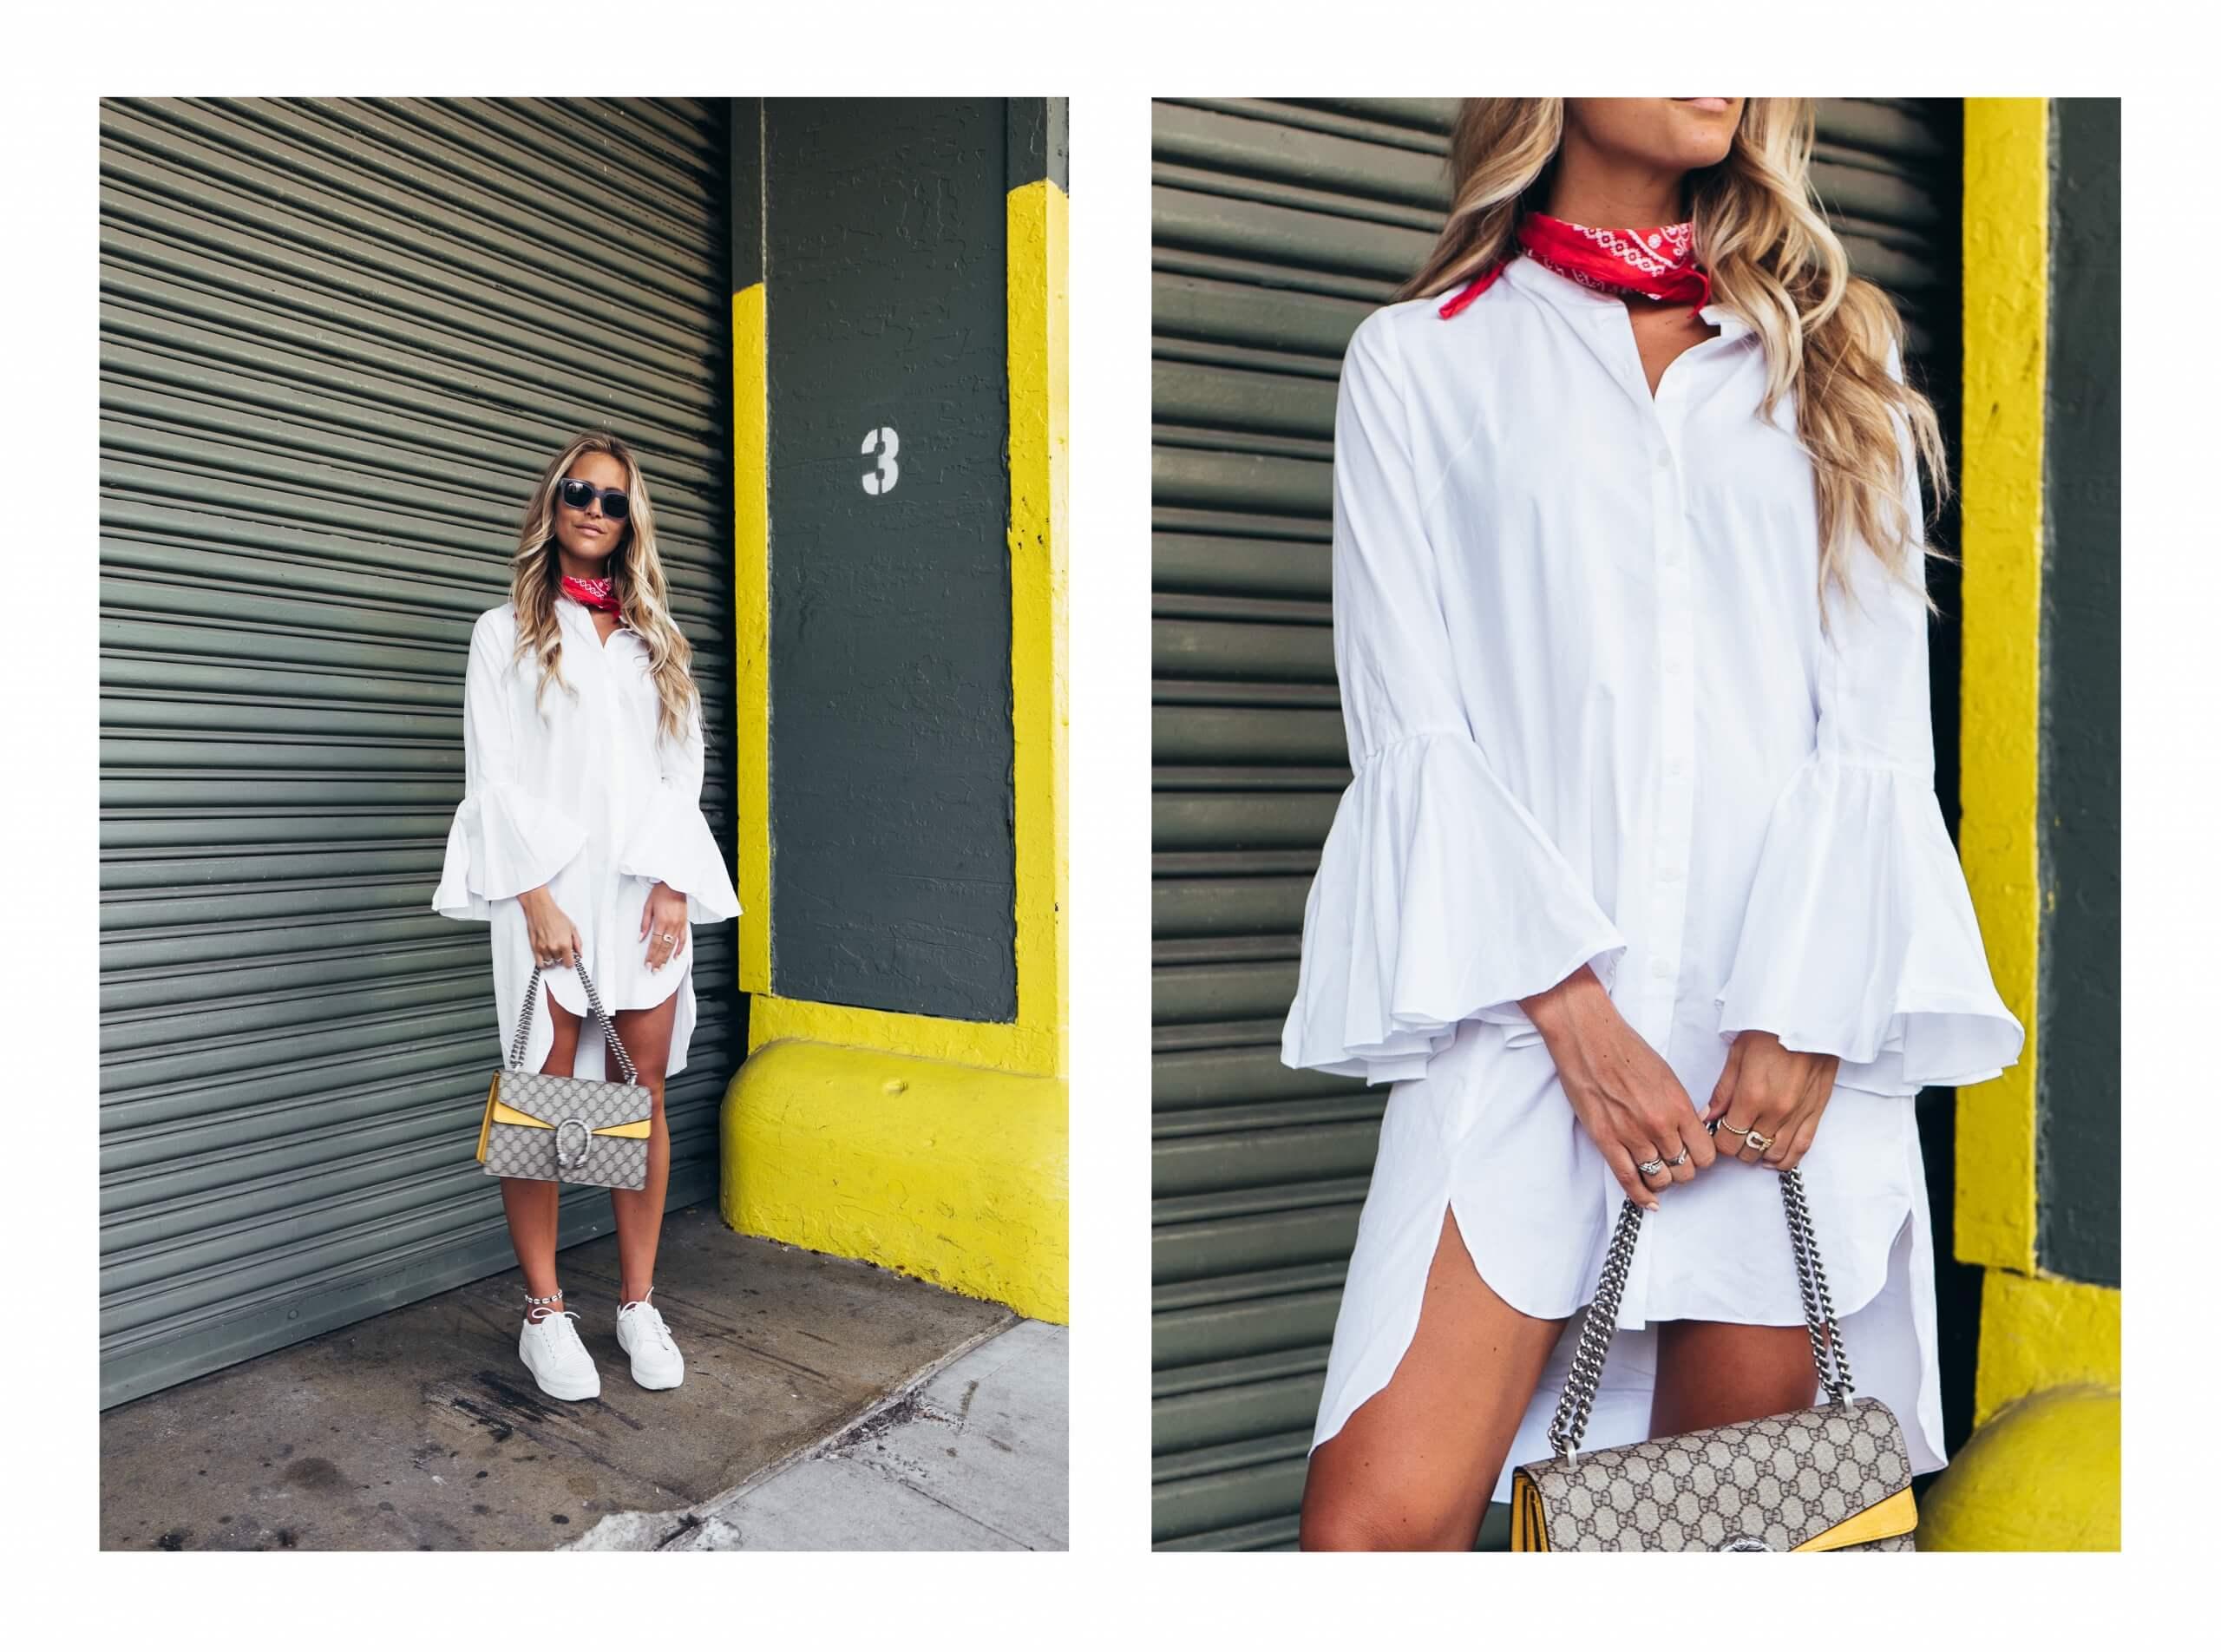 janni-deler-white-shirt-dressL1050126 copy